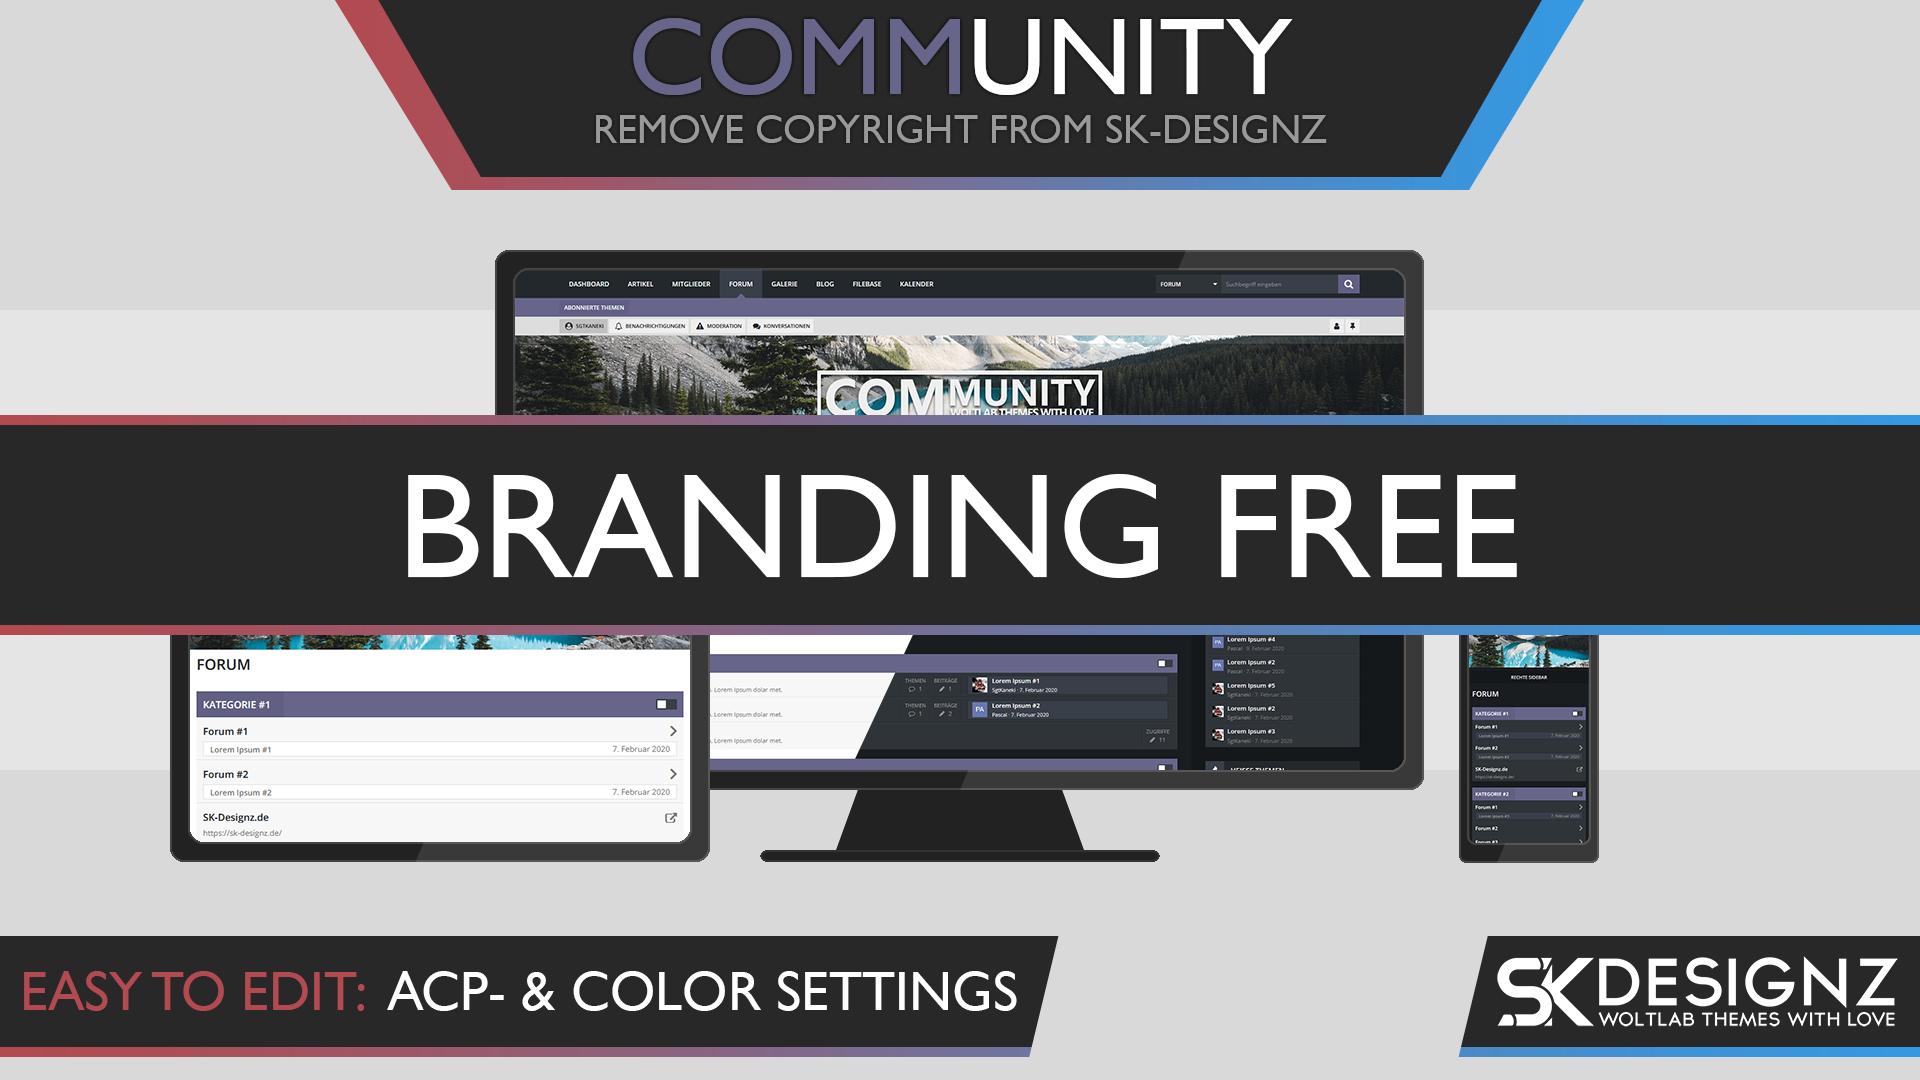 Community - Branding Free